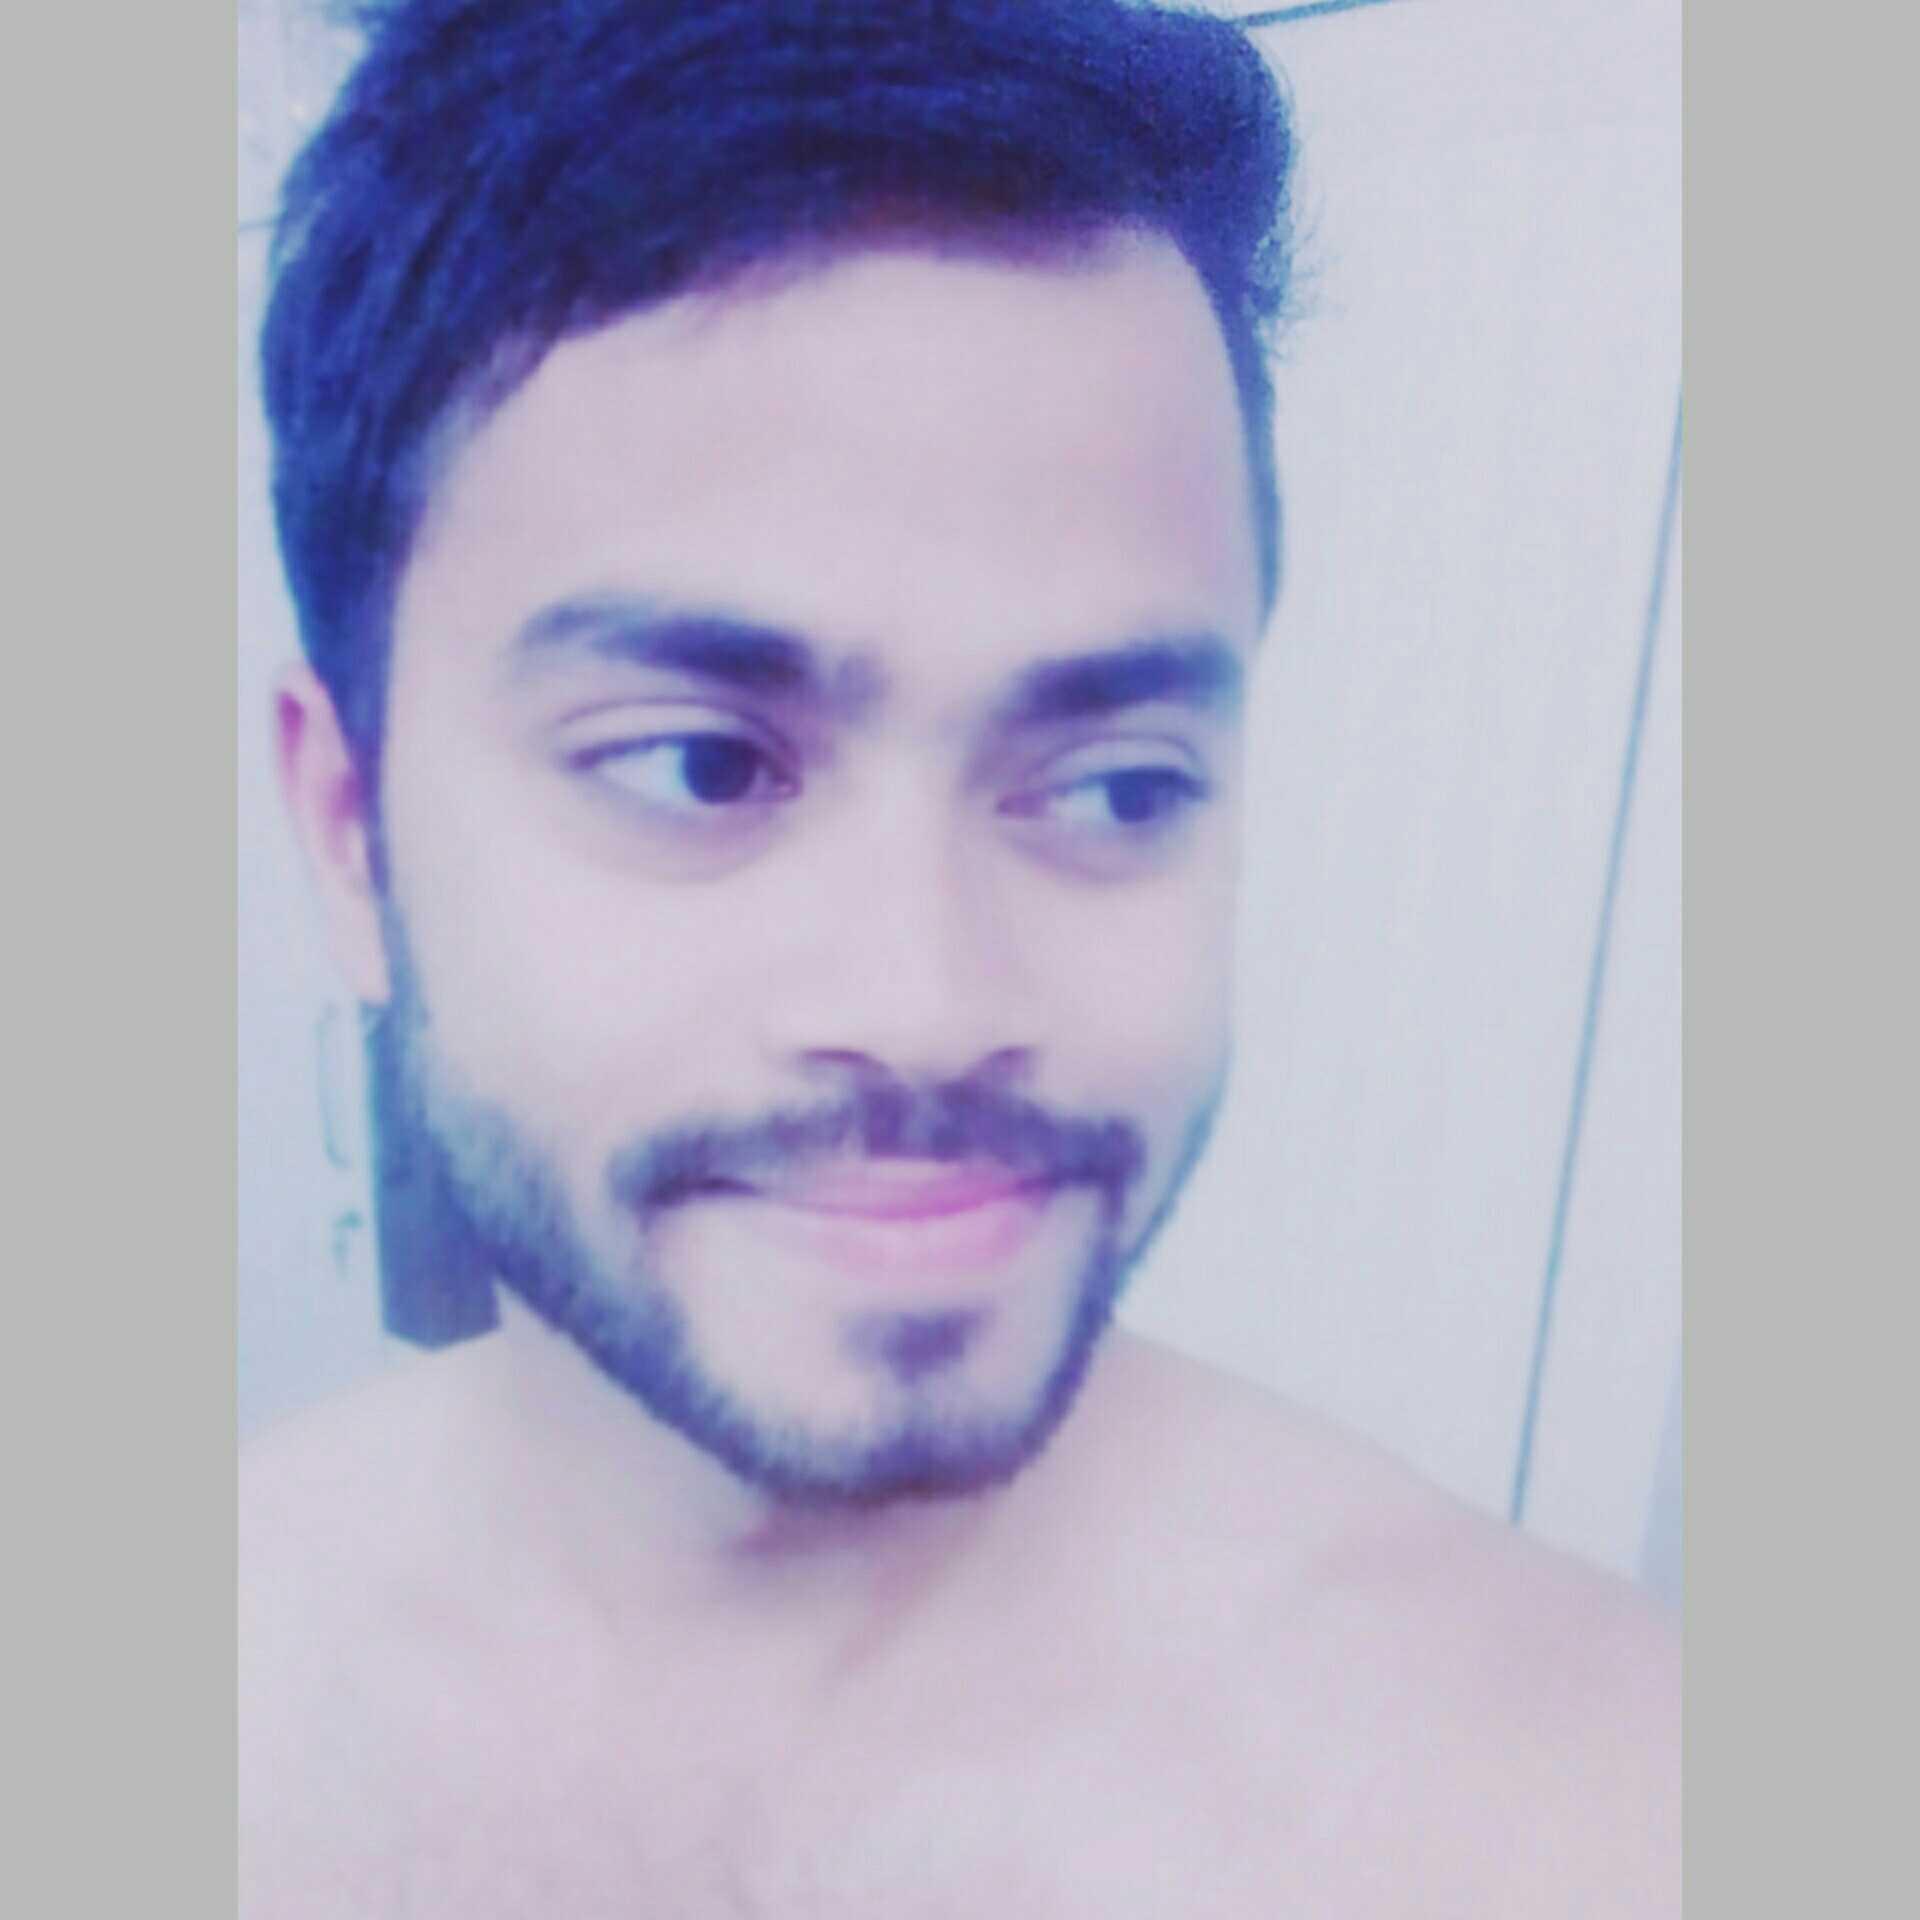 Ankur Jha Delhite-26jan🎂-ankur_jha26-insta